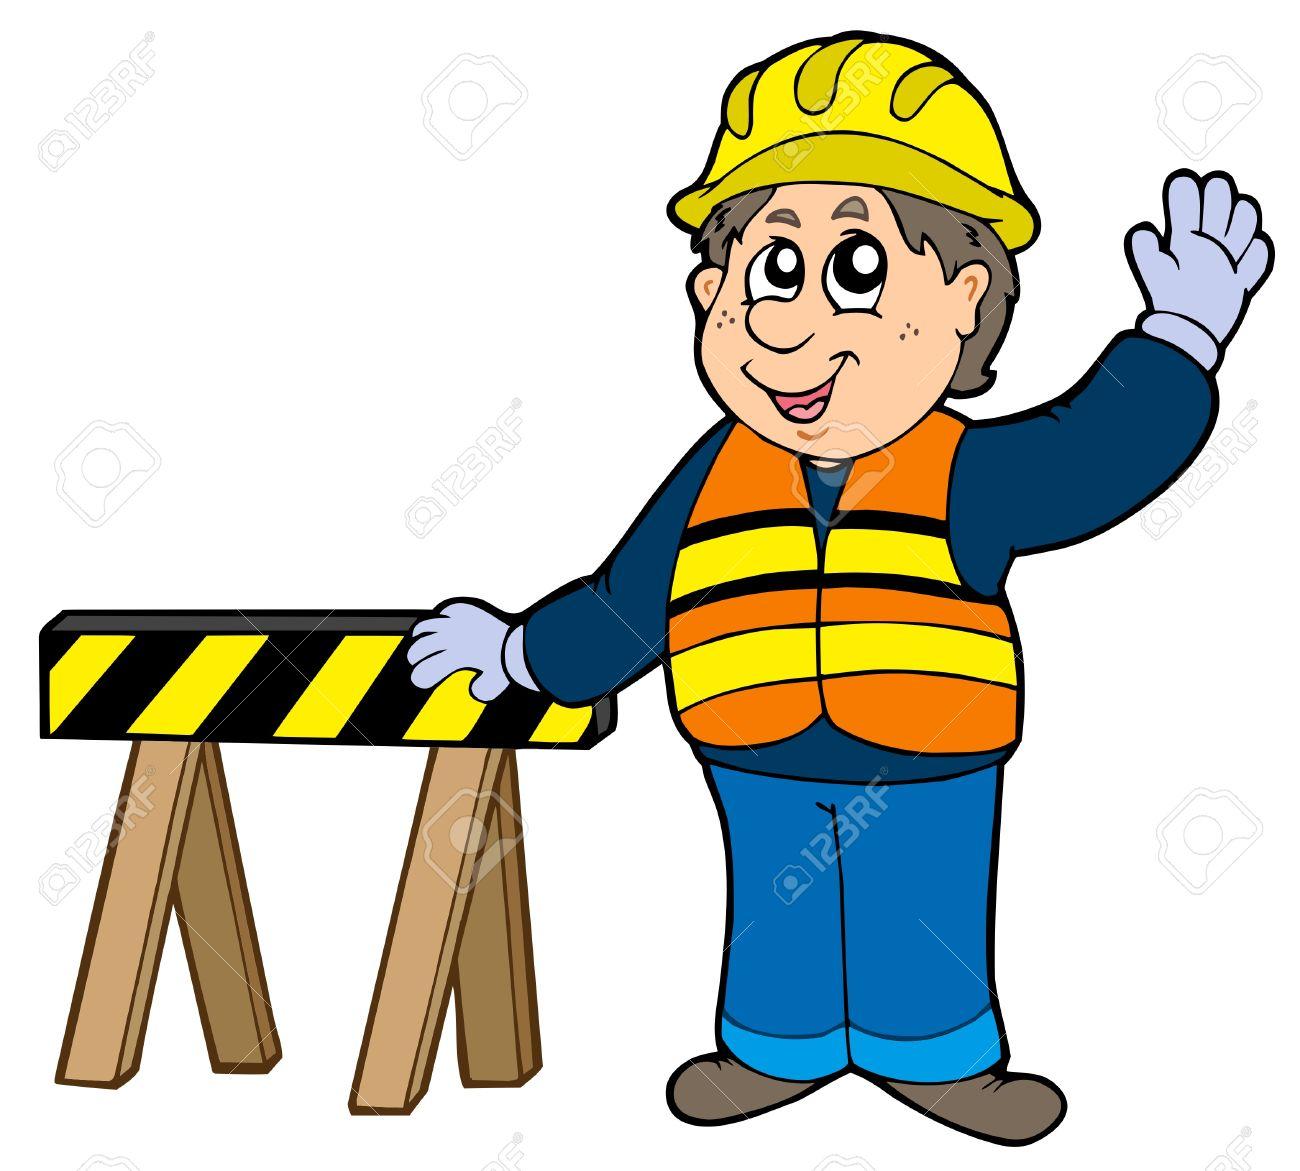 Cartoon construction worker - illustration. - 6839748